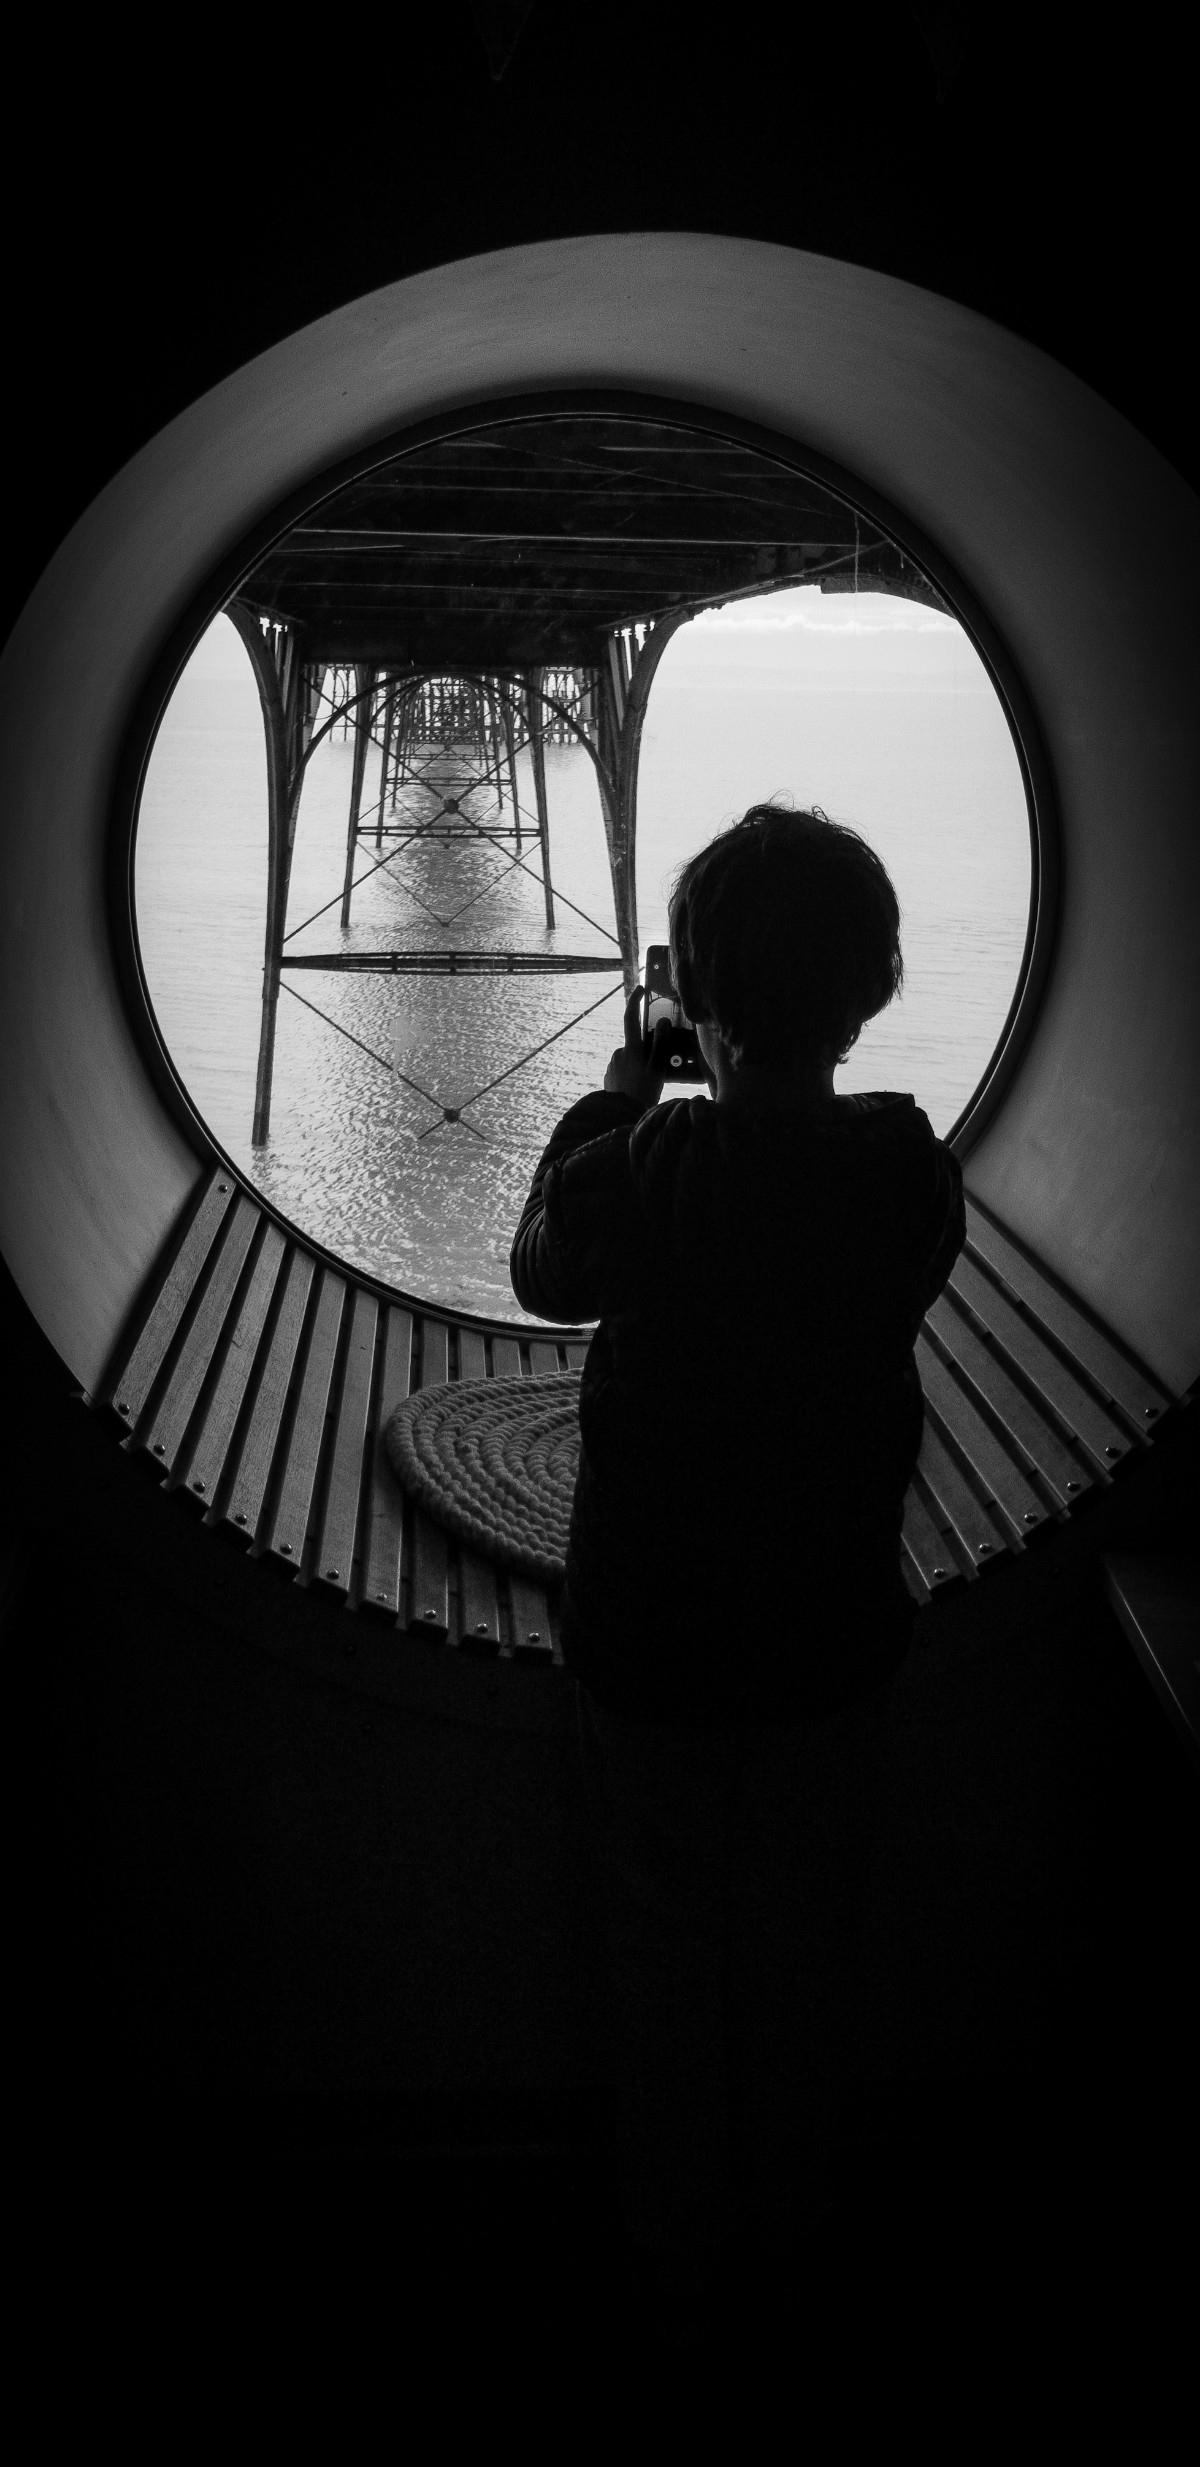 underbelly Clevedon pier - SamsungS8 - john_earle | ello